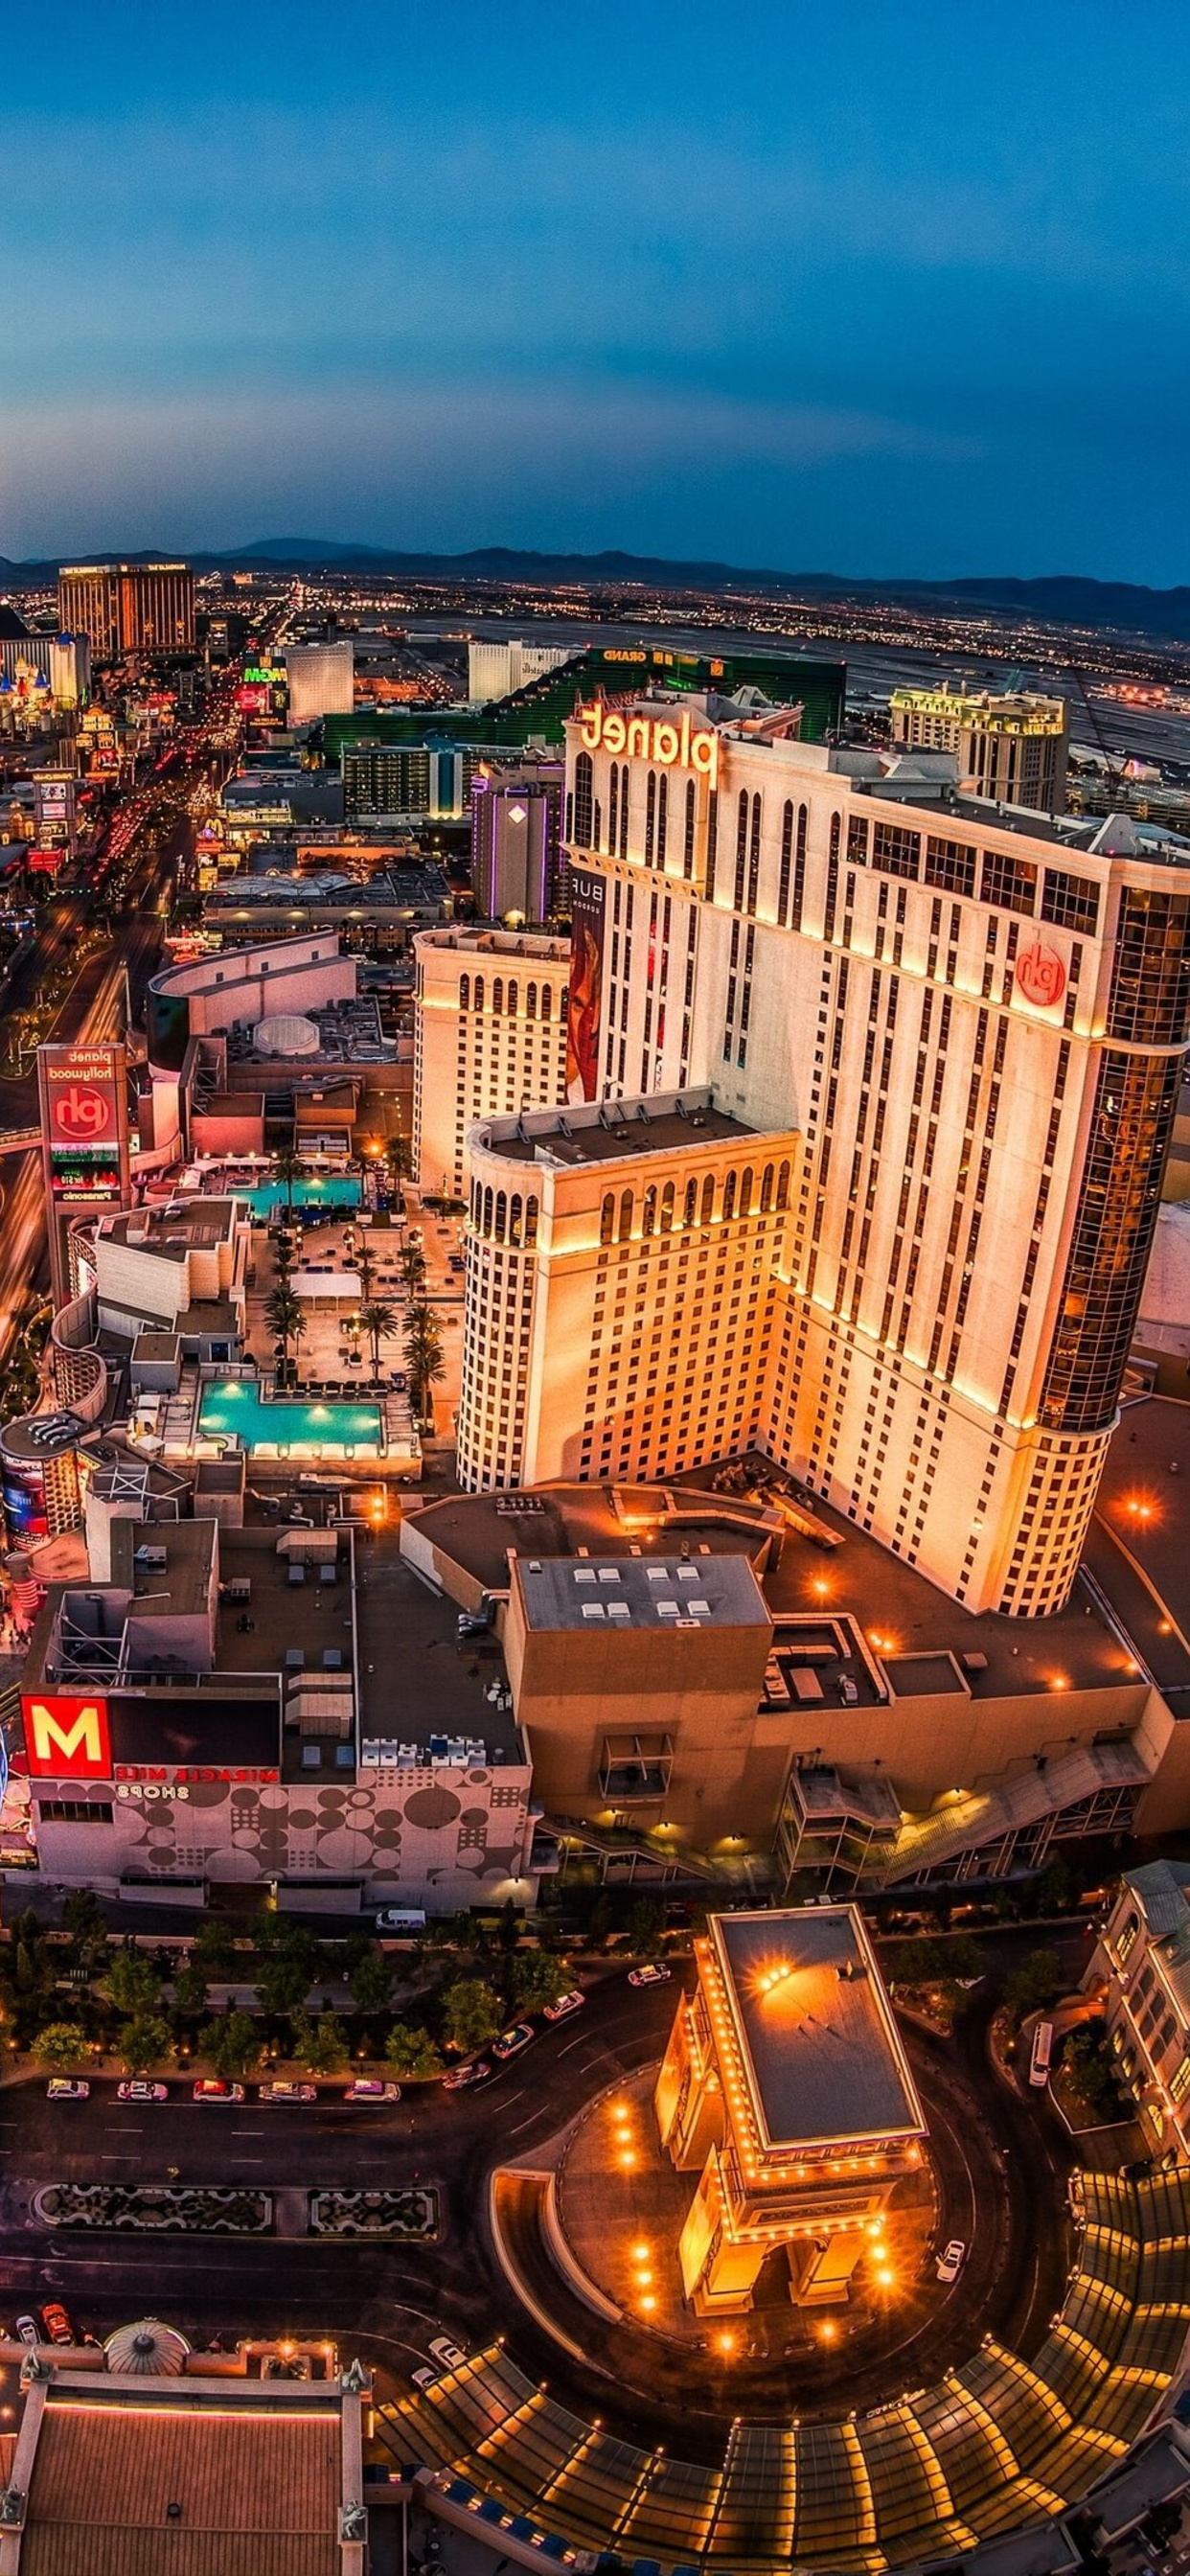 Iphone Xs Max Las Vegas Wallpaper